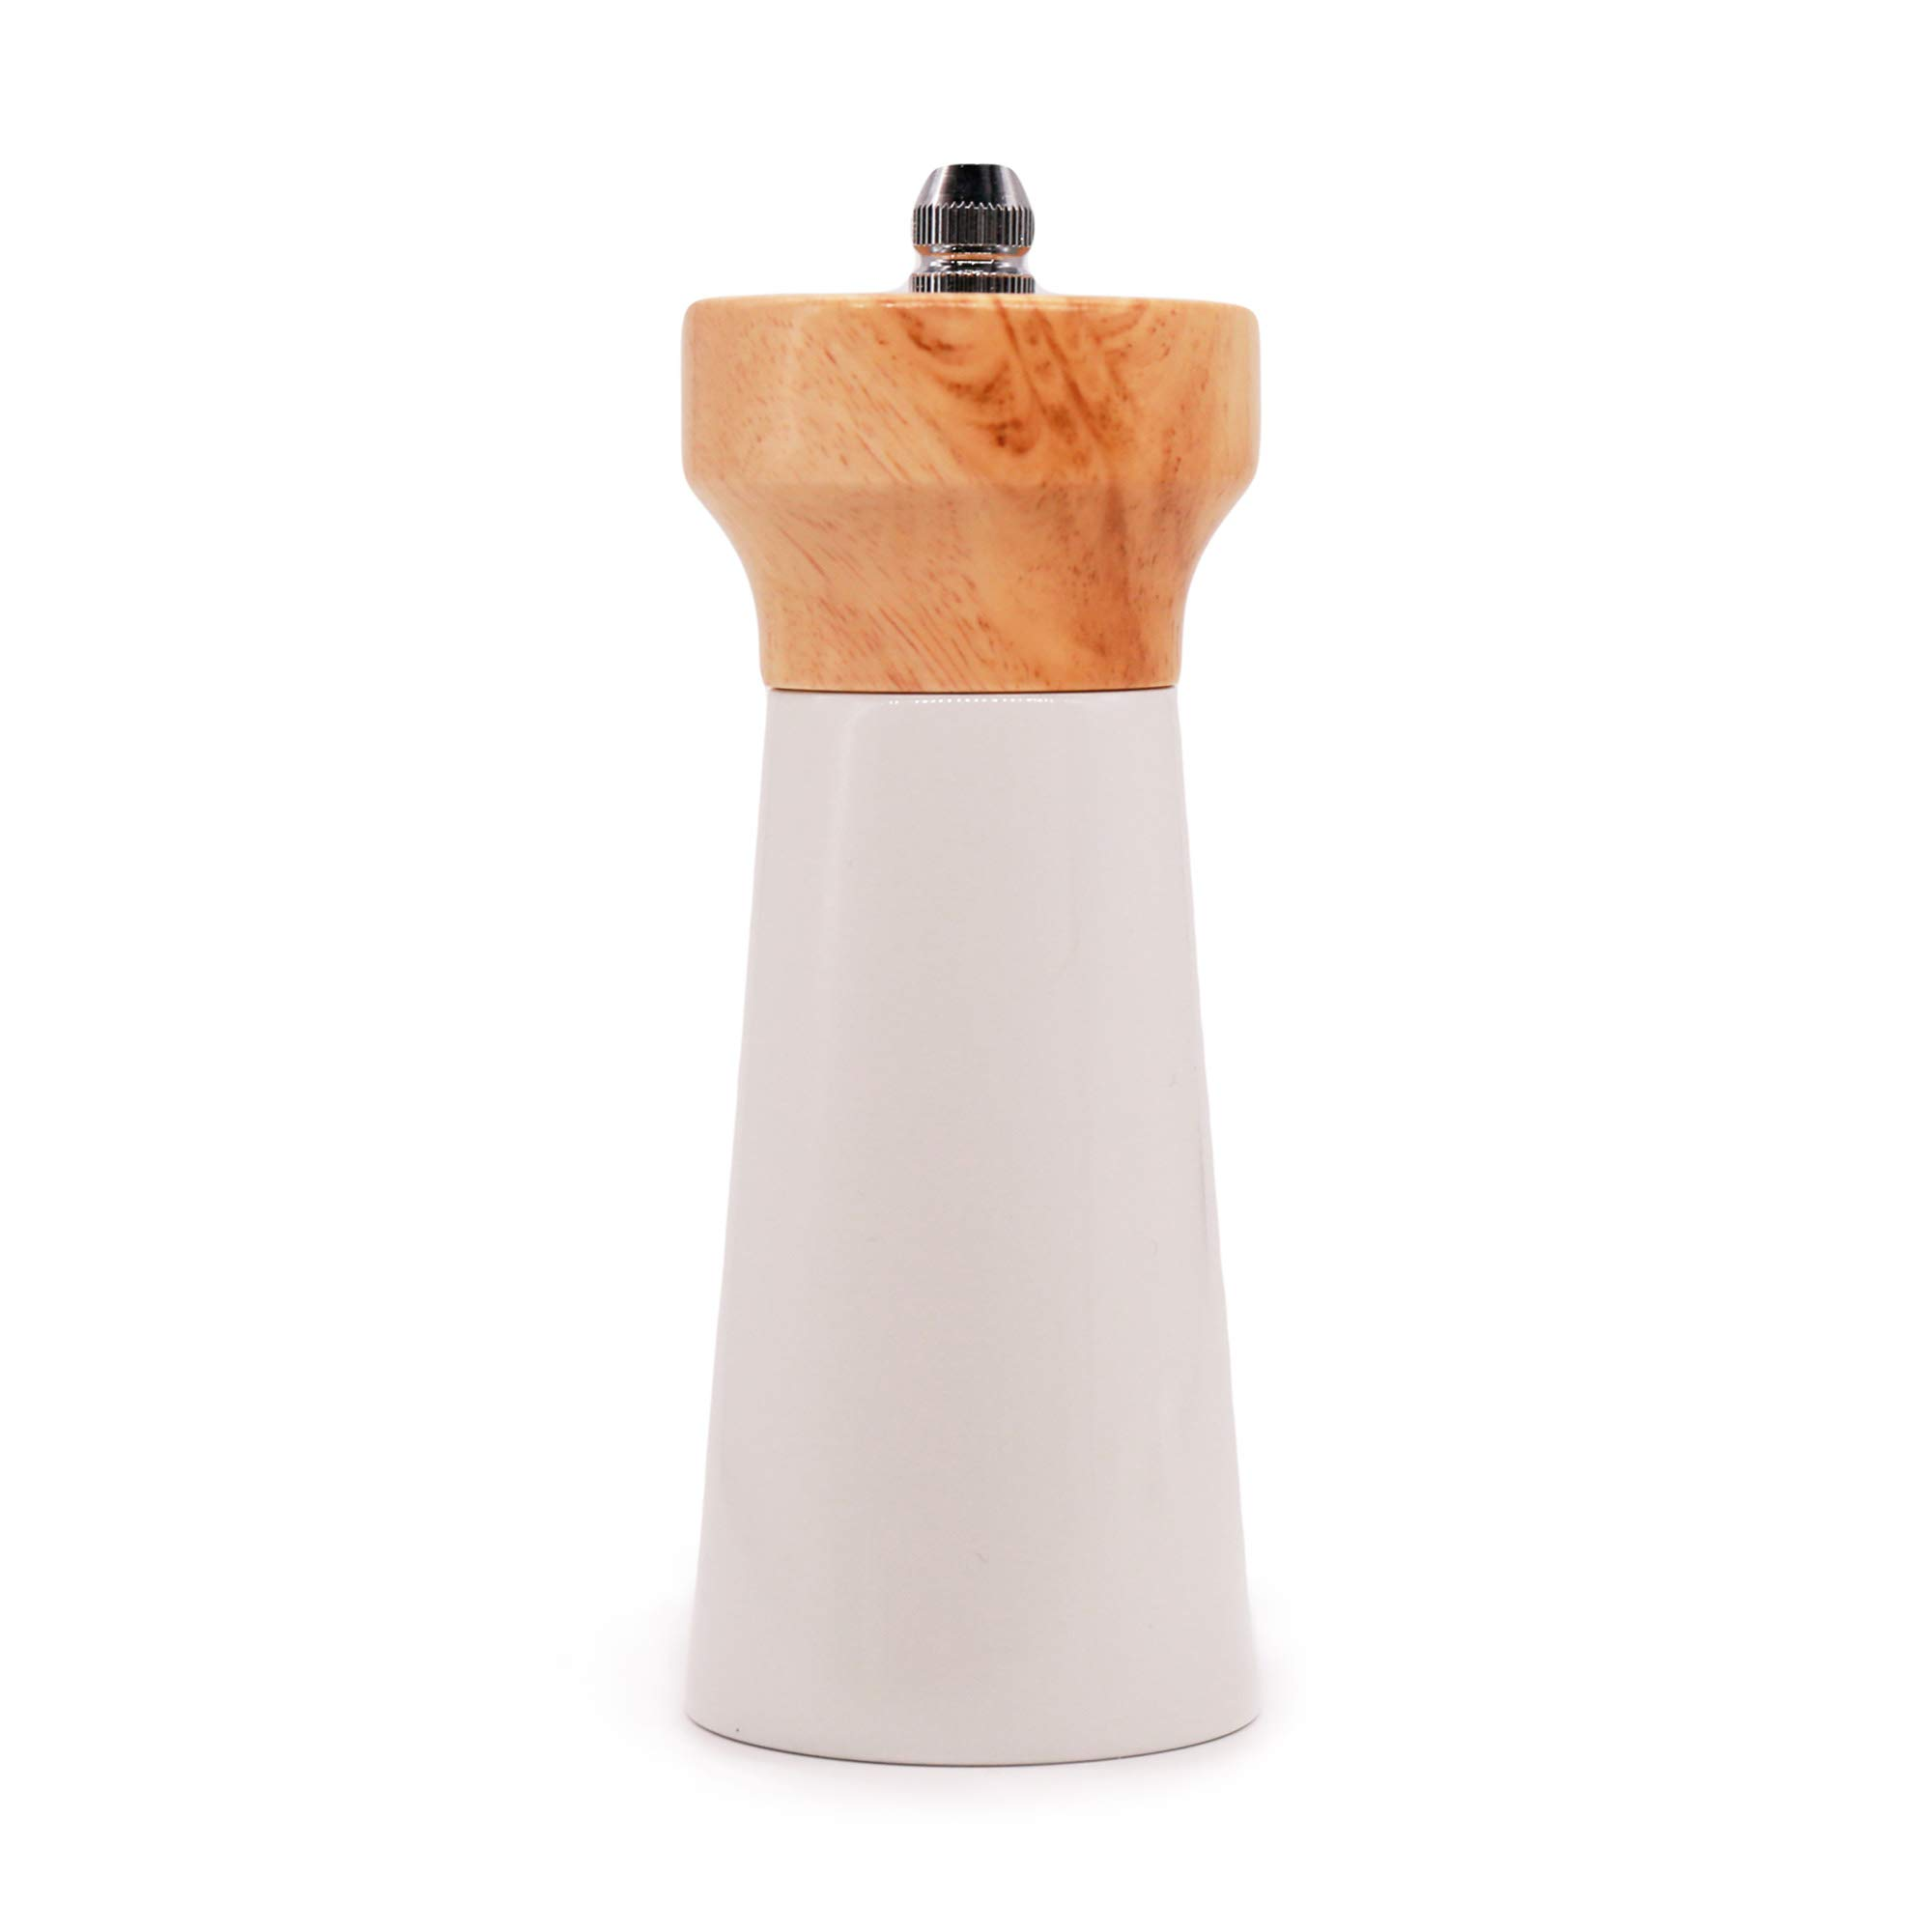 "Wooden Pepper Grinder Sea Salt and Pepper Shakers 5"" Manual Mills Effortless Shakers Lighthouse Shaped Blue & White by (5"", White) by Tessïe & Jessïe (Image #1)"